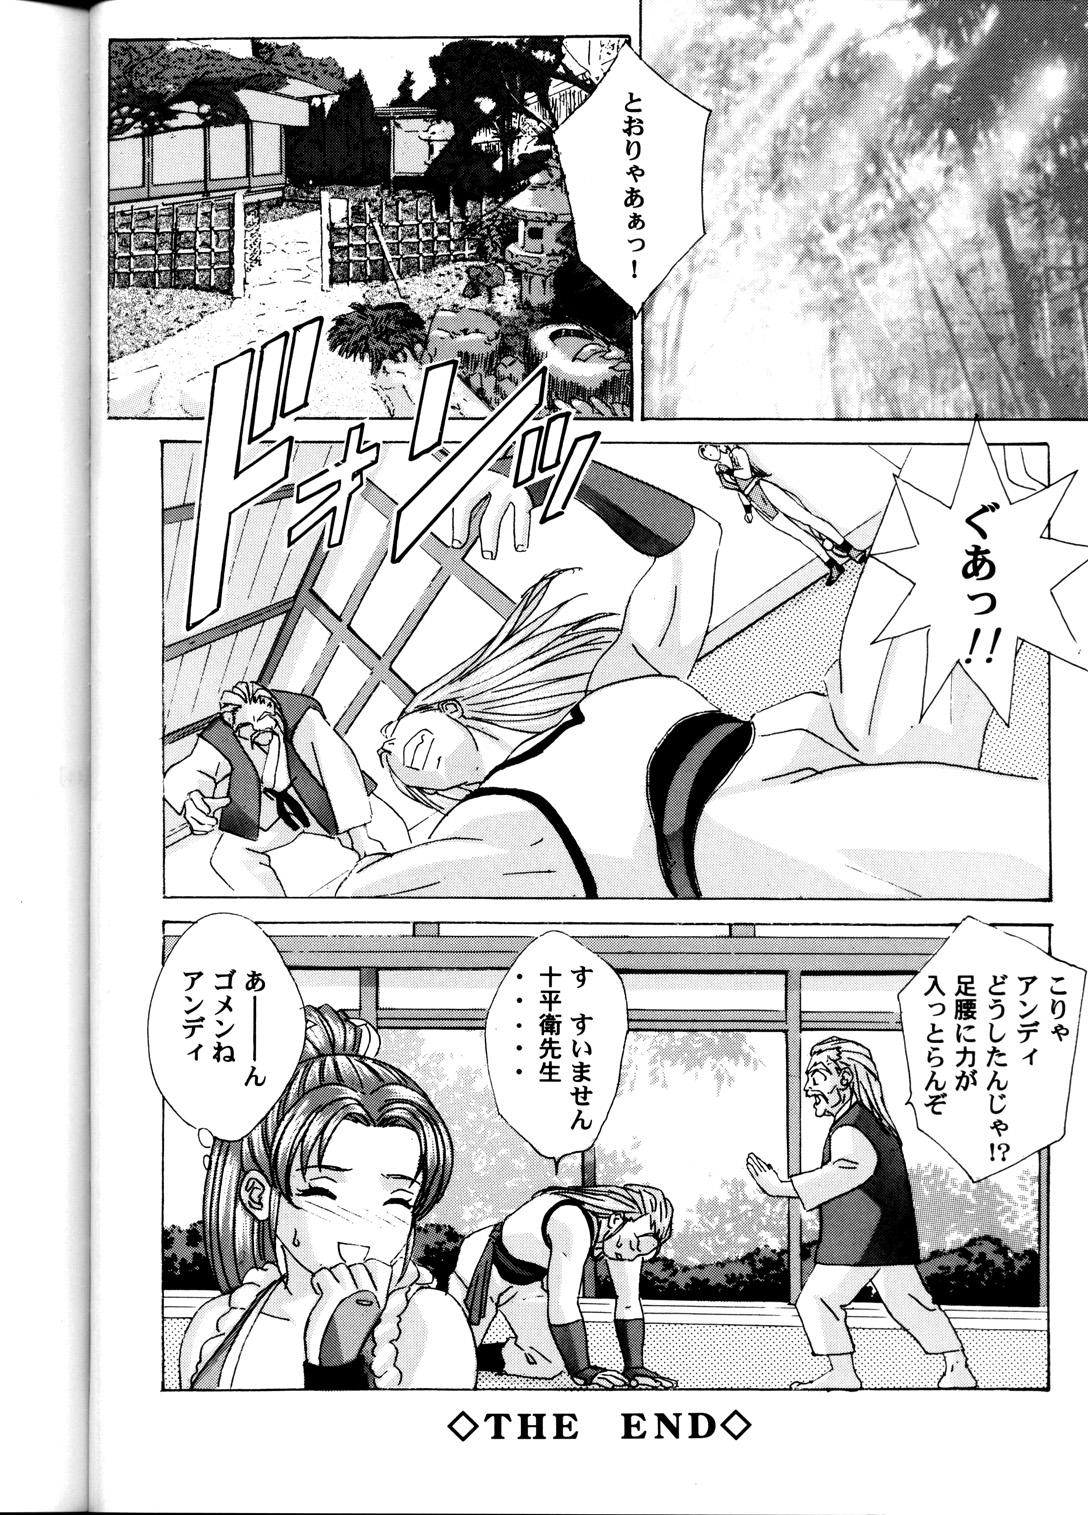 (C60) [D-LOVERS (Nishimaki Tohru)] Mai -Innyuuden- Daiichigou (King of Fighters) 40